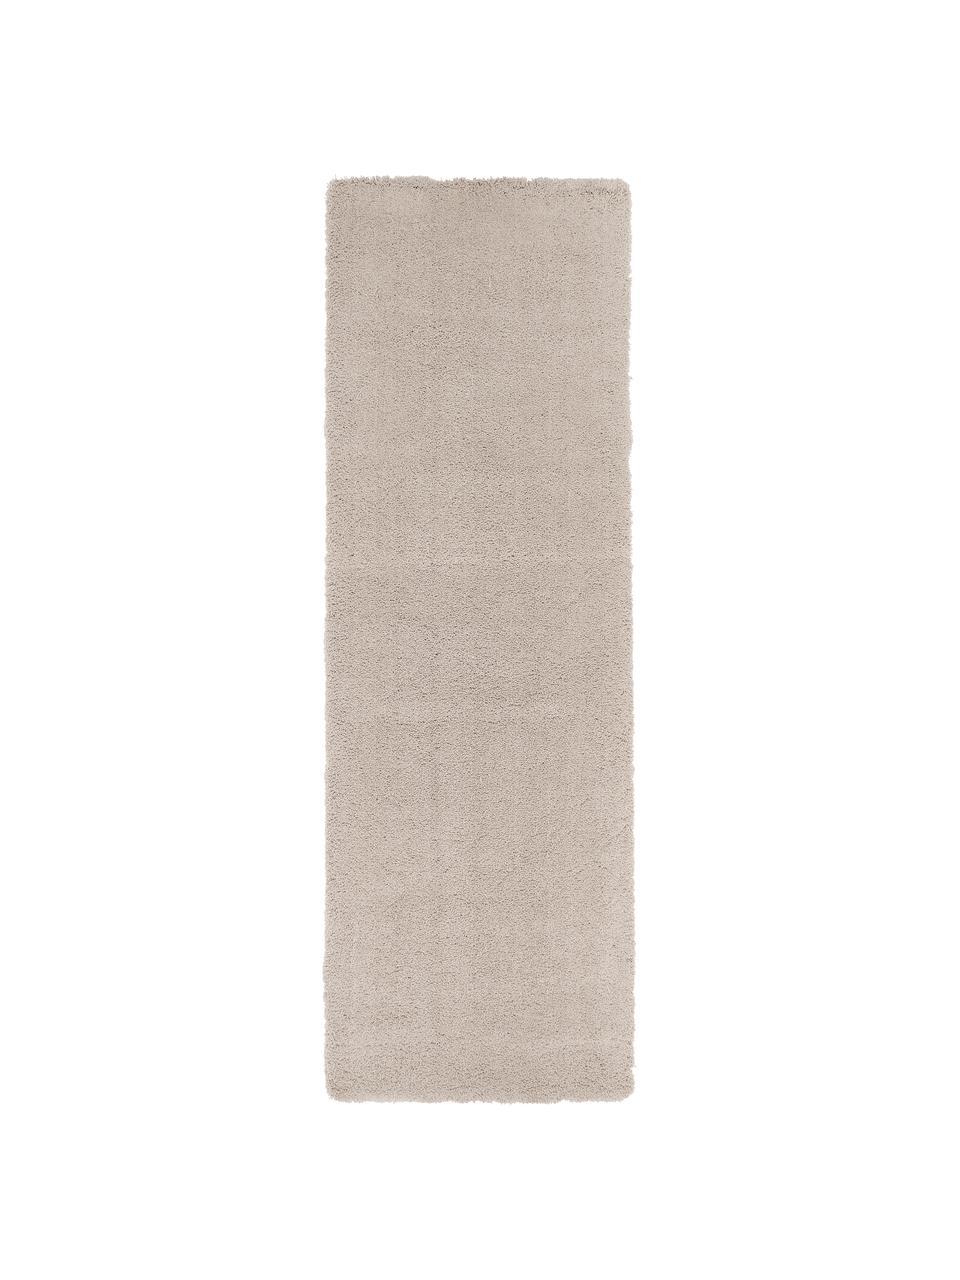 Passatoia pelosa morbida beige Leighton, Retro: 70% poliestere, 30% coton, Beige-marrone, Larg. 80 x Lung. 250 cm